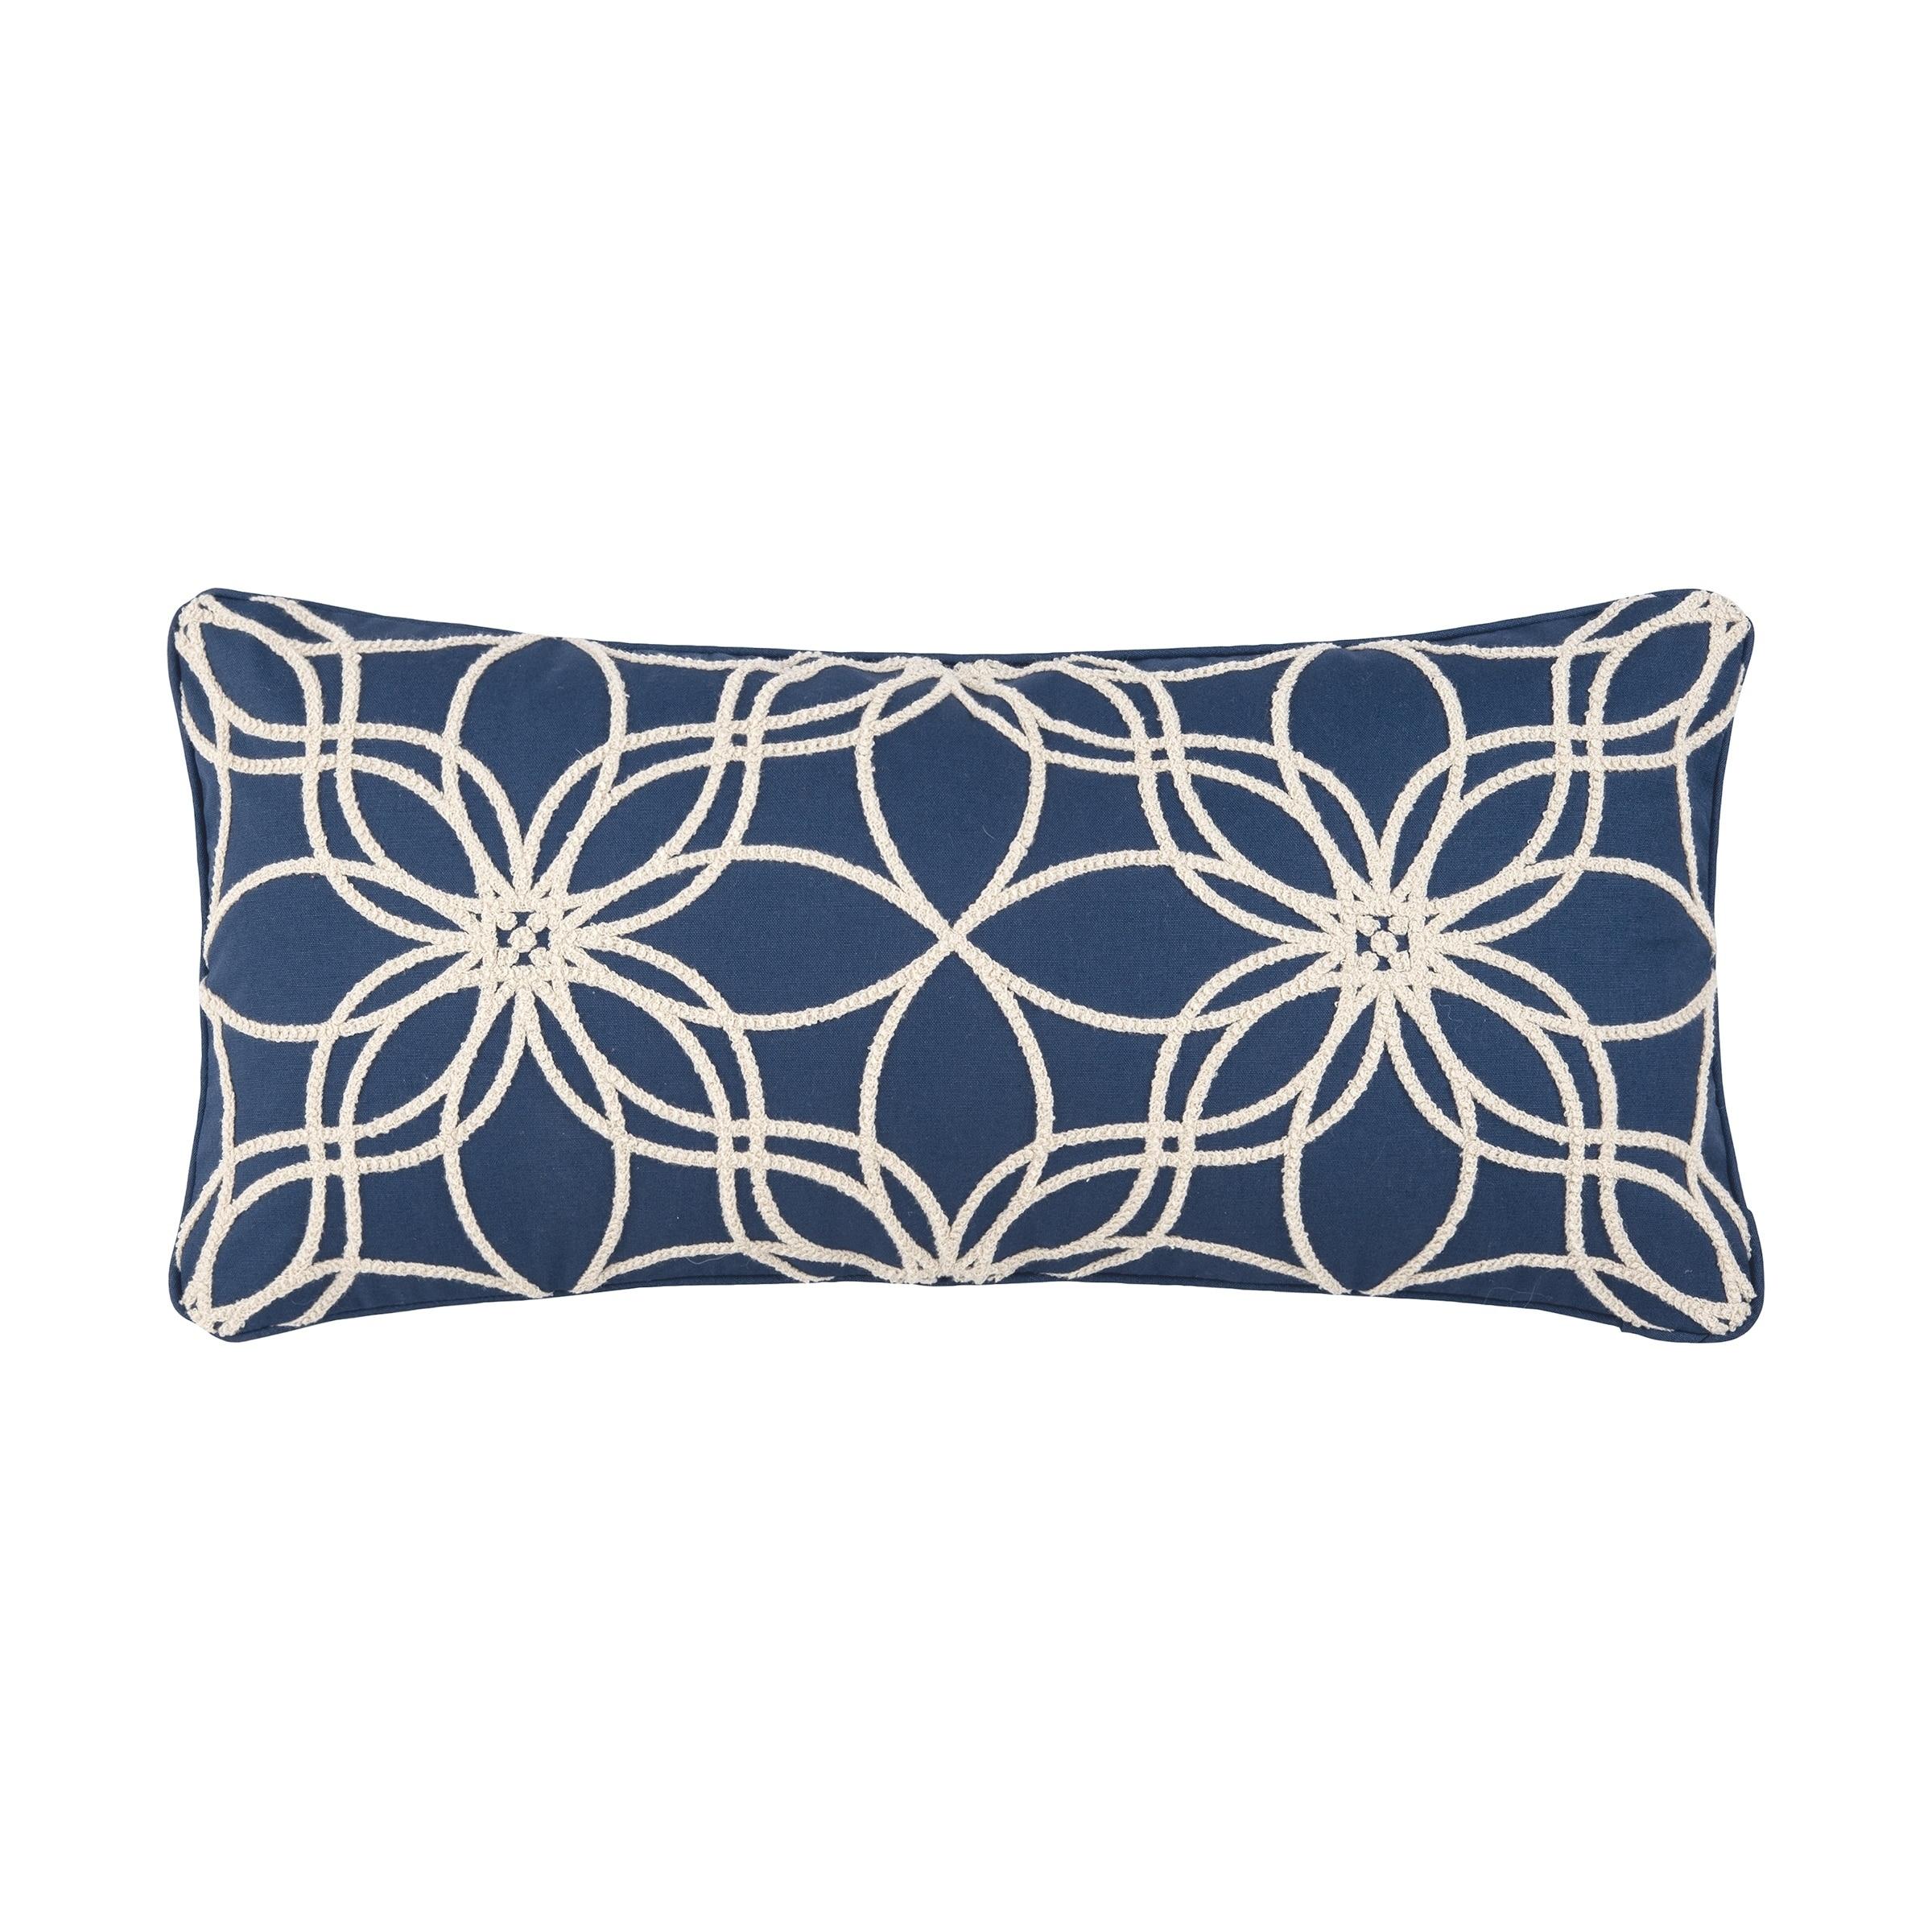 Skylark 12 x 24 Pillow (Tan/Sand)